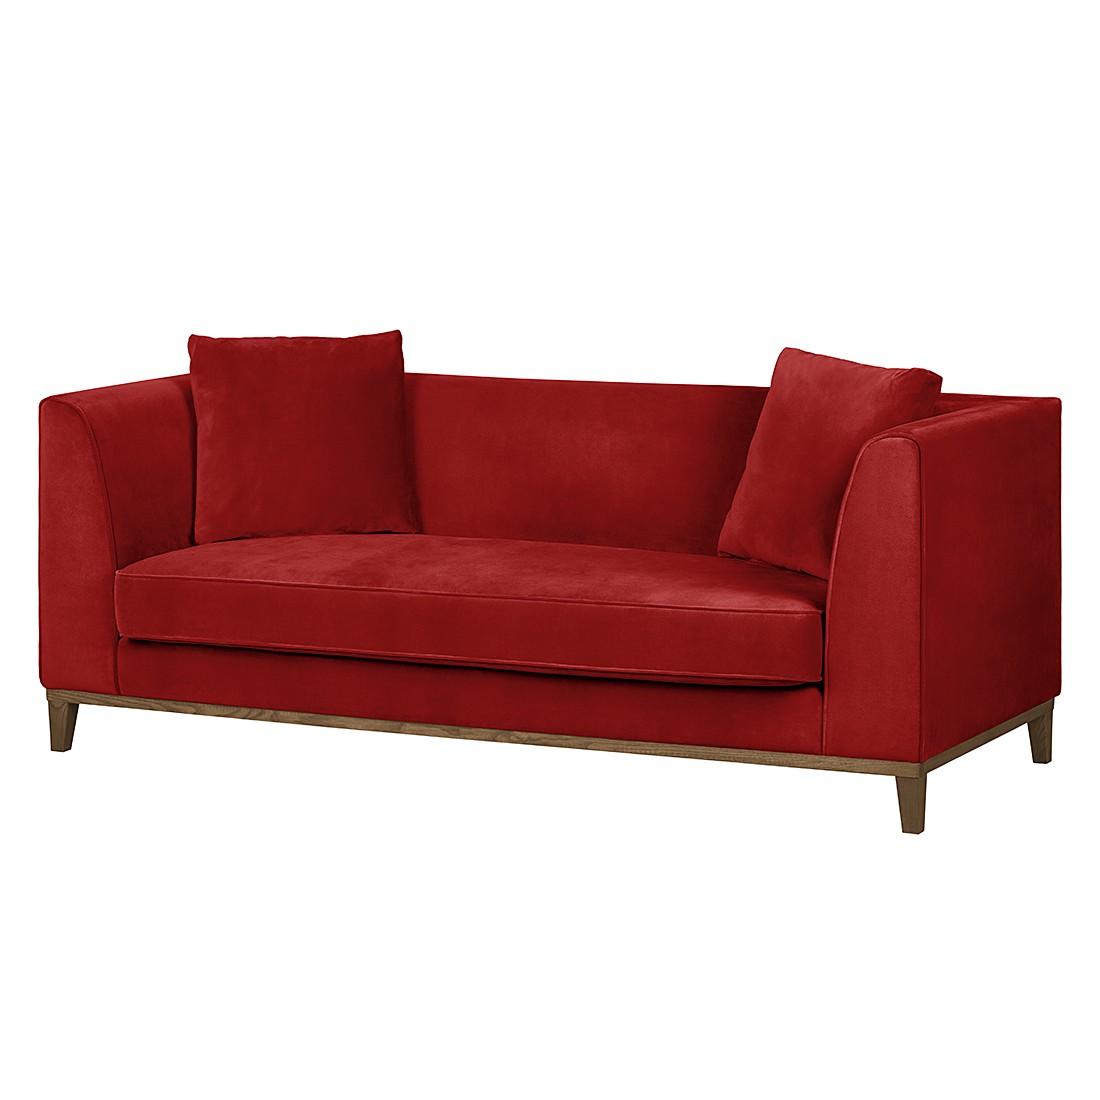 Sofa Blomma (3-Sitzer) – Samtstoff Rot – Gestell: Eichefarbig, Mørteens online bestellen